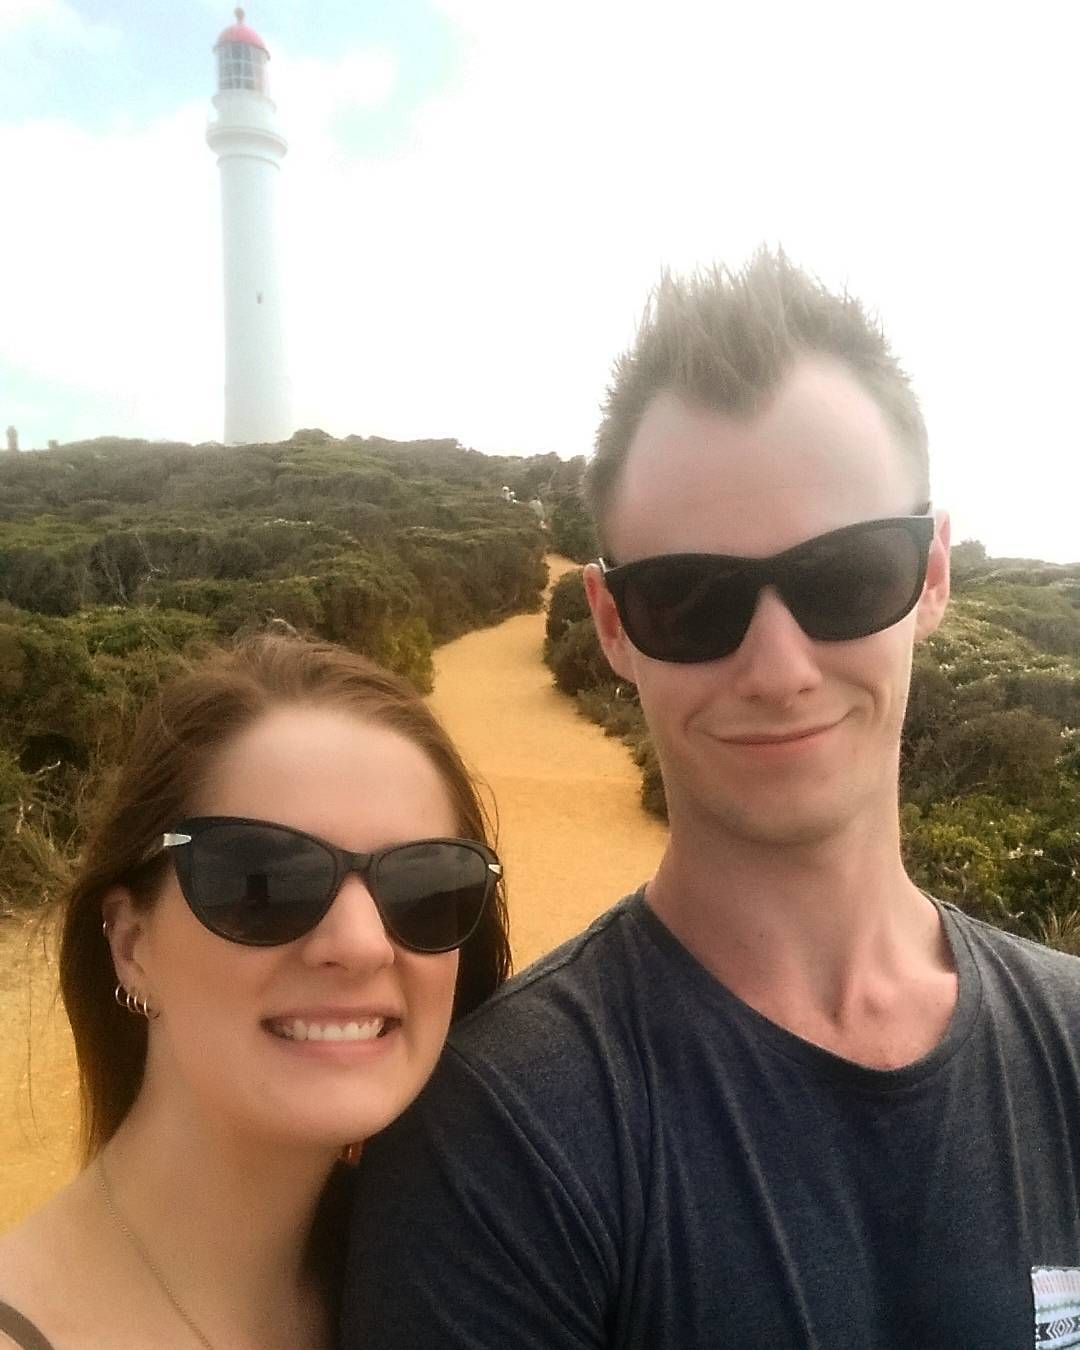 Lighthouse hangs  @bradcathie #aireysinlet #thegreatoceanroad #torquay #lorne #splitpointlighthouse #roundthetwist #holiday #adventures by helleetitch http://ift.tt/1IIGiLS